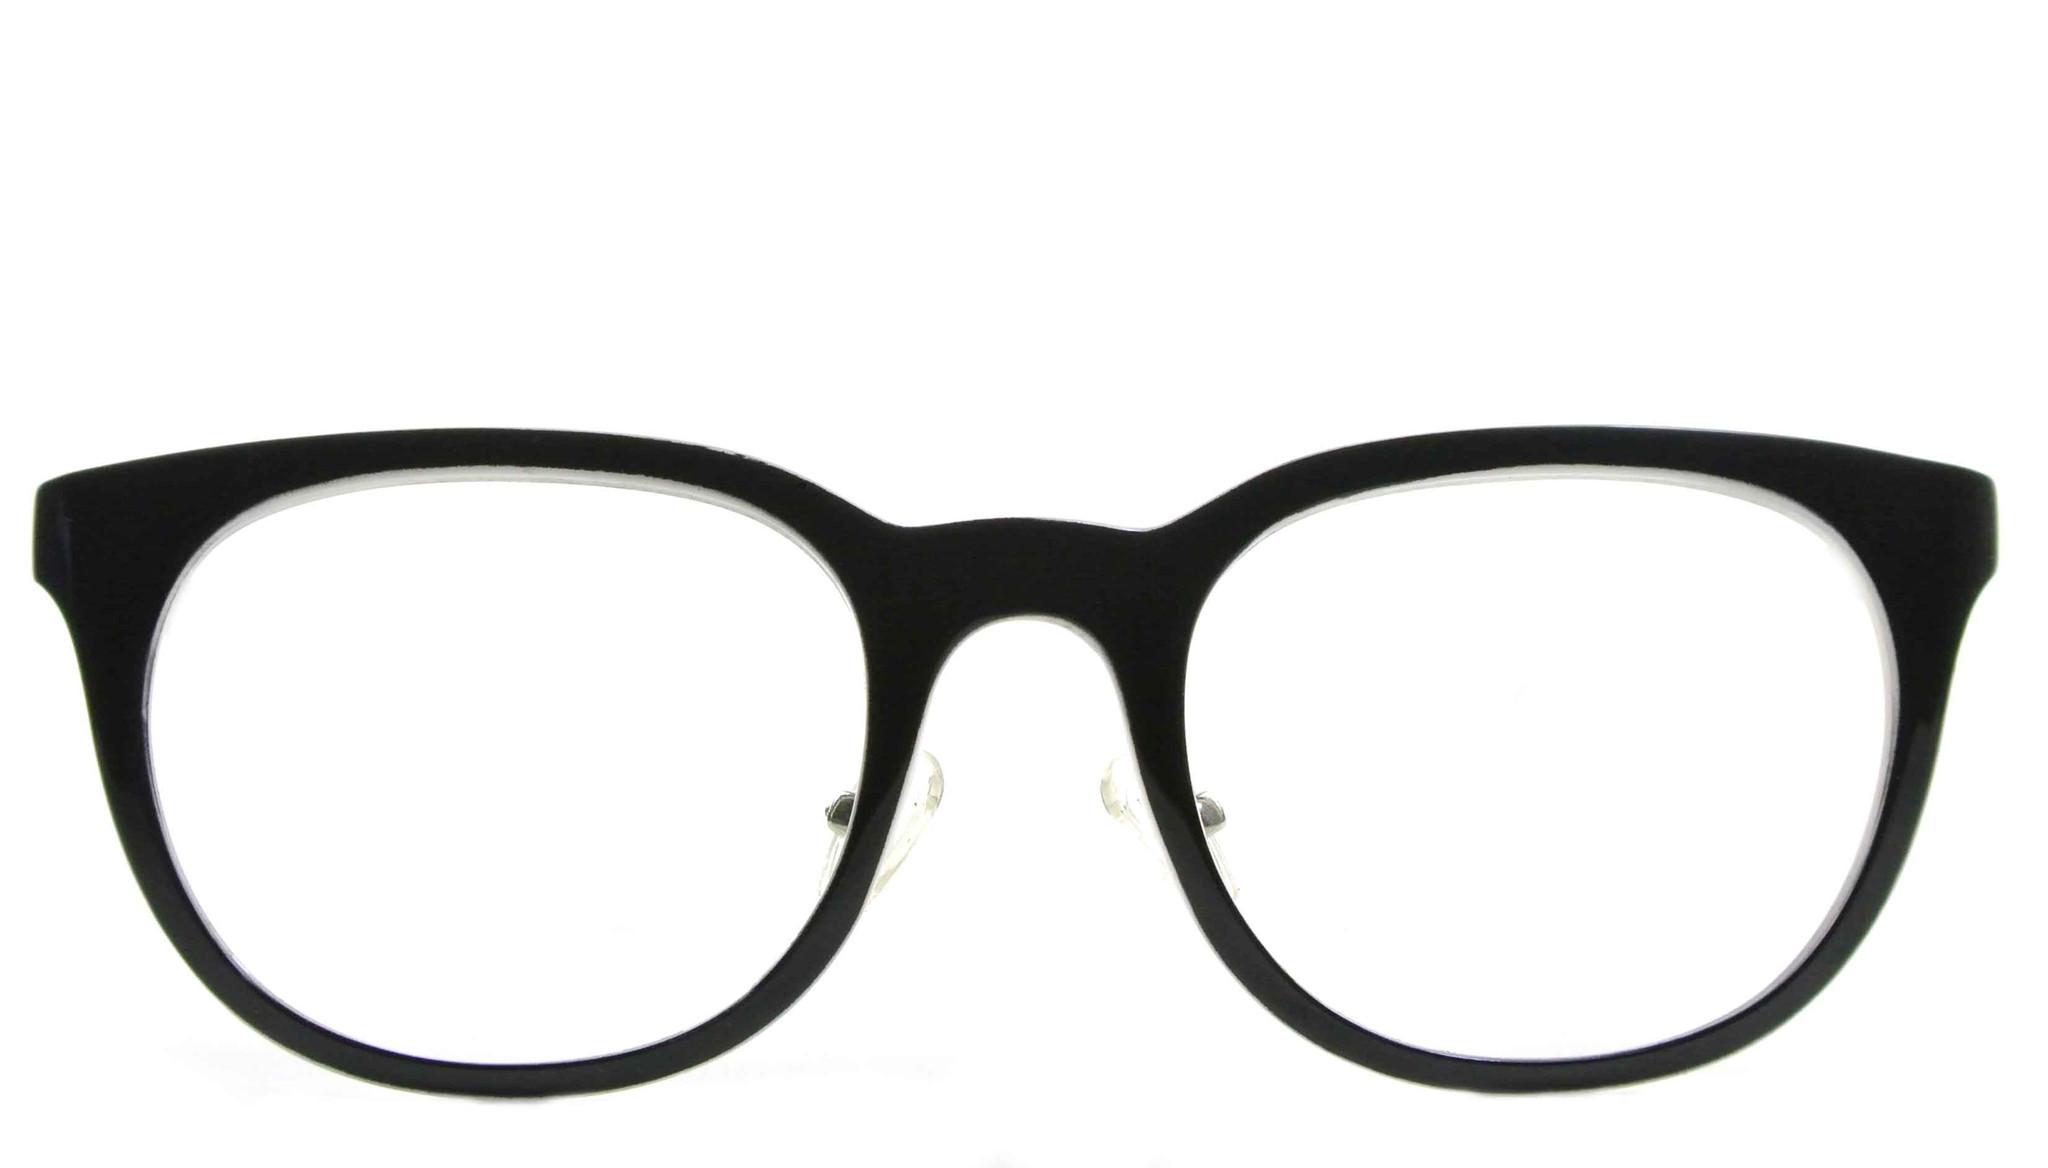 Glasses Online: Designer Eyewear, Prescription Sunglasses & Eyeglass Frames Welcome to adalatblog.ml, The World's Largest Online Prescription Glasses, Sunglasses, Optical Frames and .